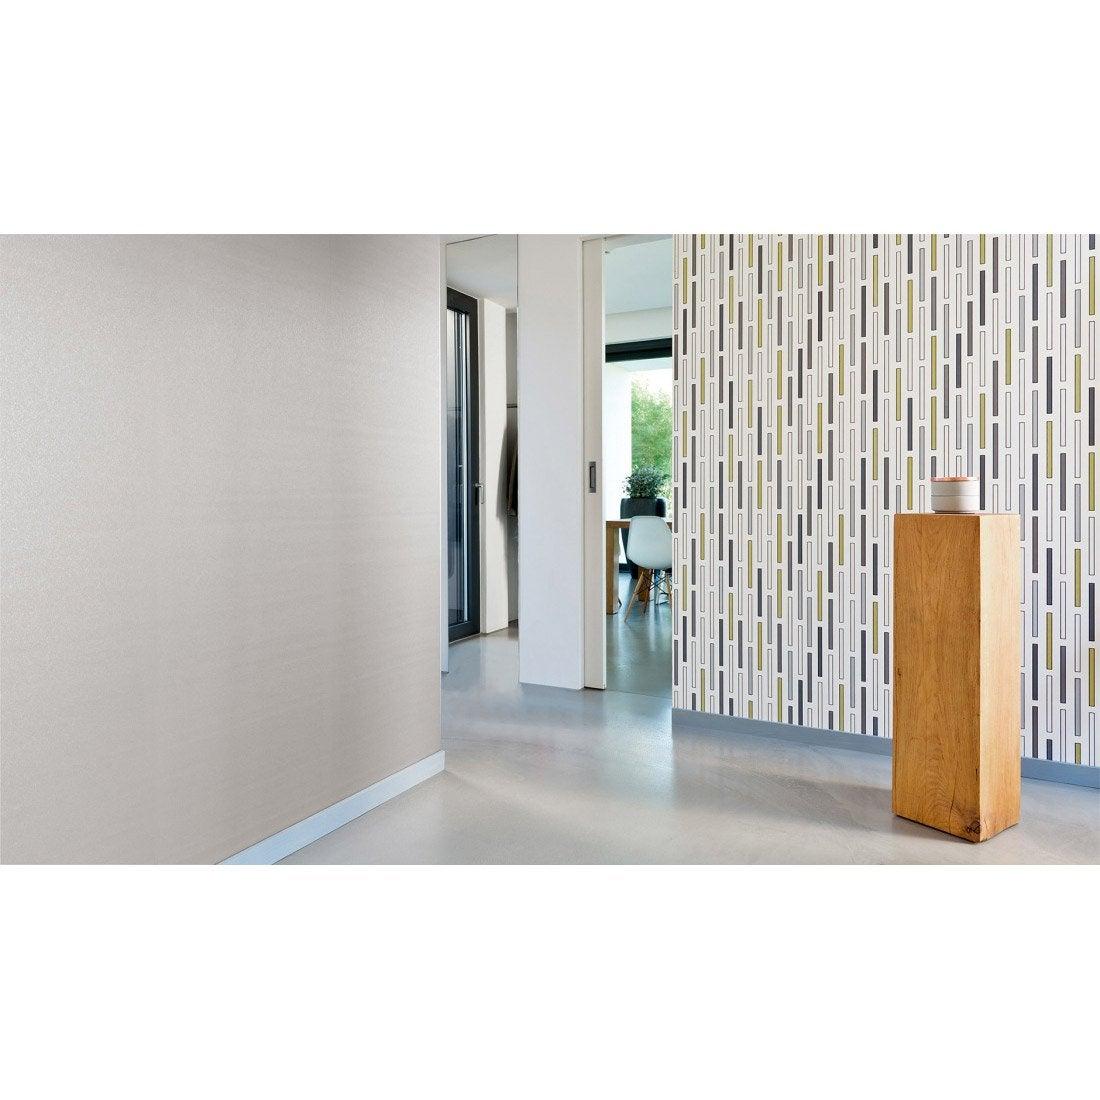 papier peint g om trique blanc or gris intiss ap 2000 leroy merlin. Black Bedroom Furniture Sets. Home Design Ideas